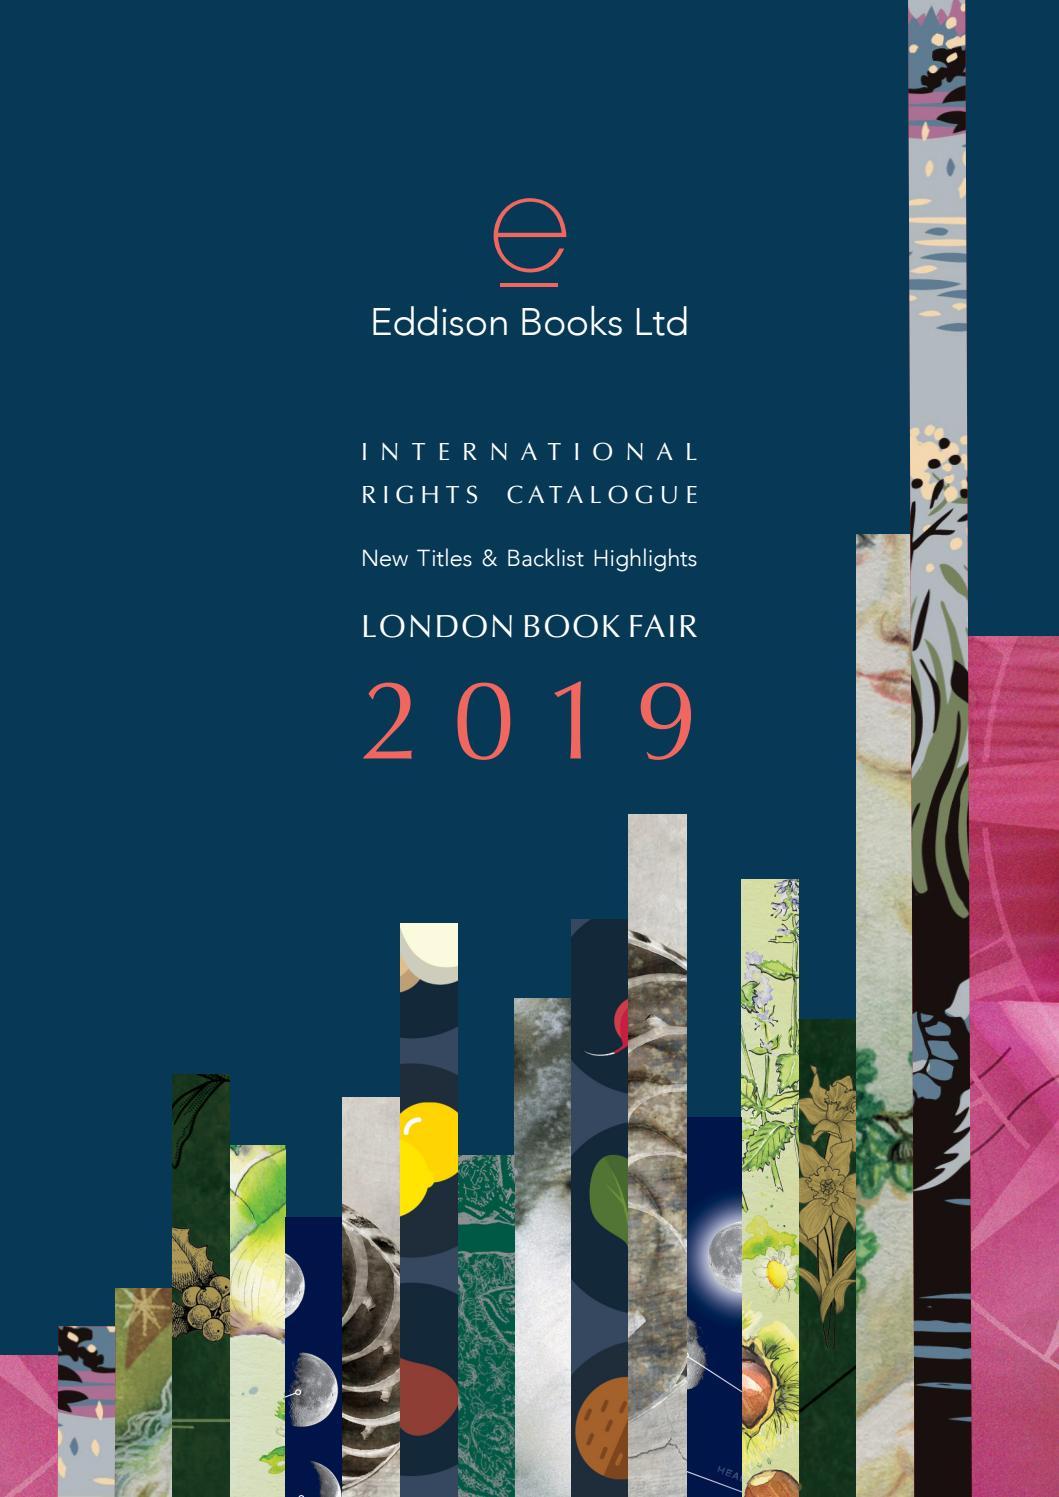 137d069b8efaa8 Eddison Books | International Rights Catalogue | London Book Fair 2019